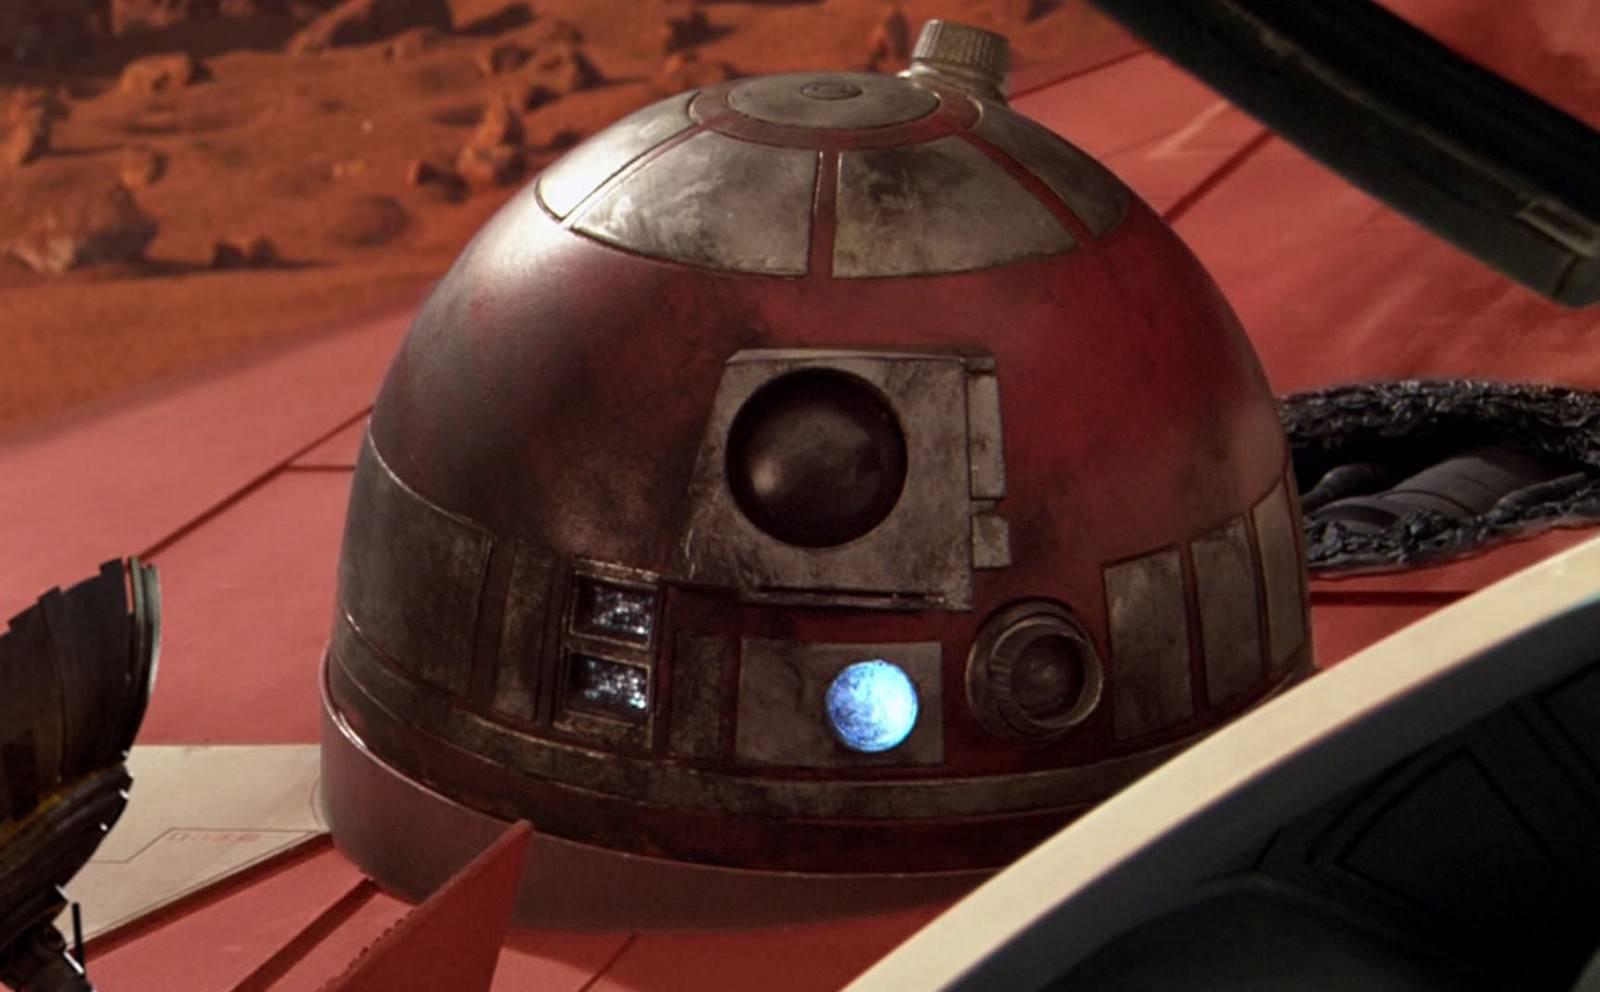 Movie, Star Wars Episode II: Attack of the Clones(美國, 2002) / 星際大戰二部曲:複製人全面進攻(台灣) / 星球大战前传:克隆人的进攻(中國) / 星球大戰前傳:複製人侵略(香港), 電影劇照